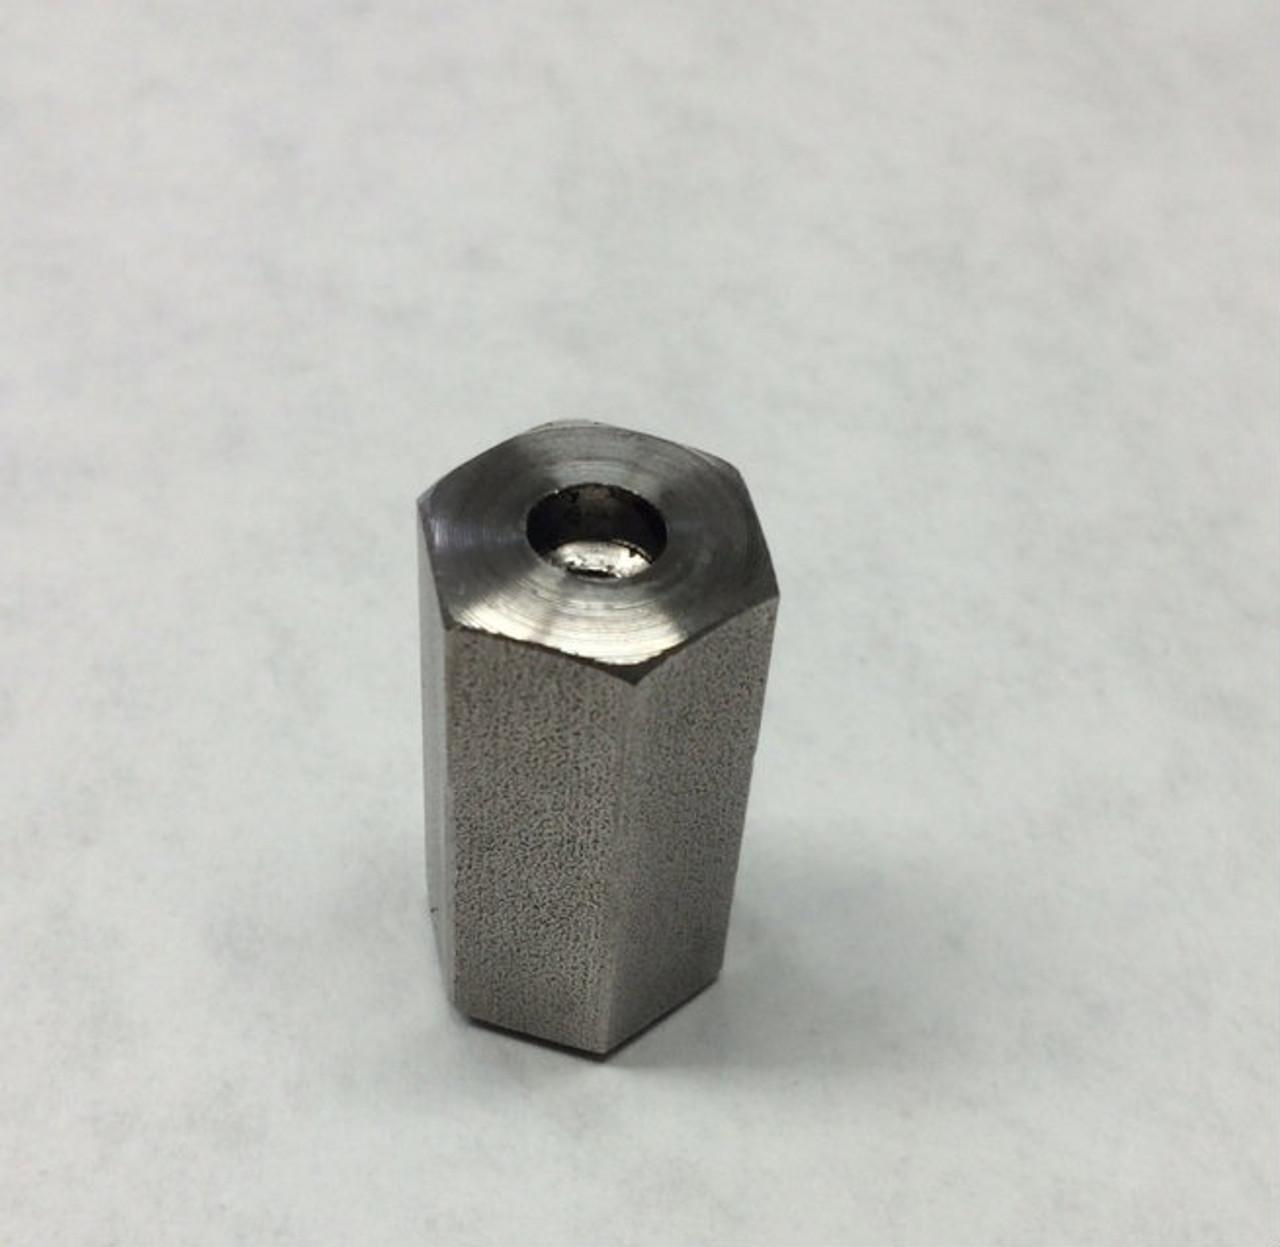 TorRey ST-295 & ST-305 Lower Magnet Sensor - 05-75020